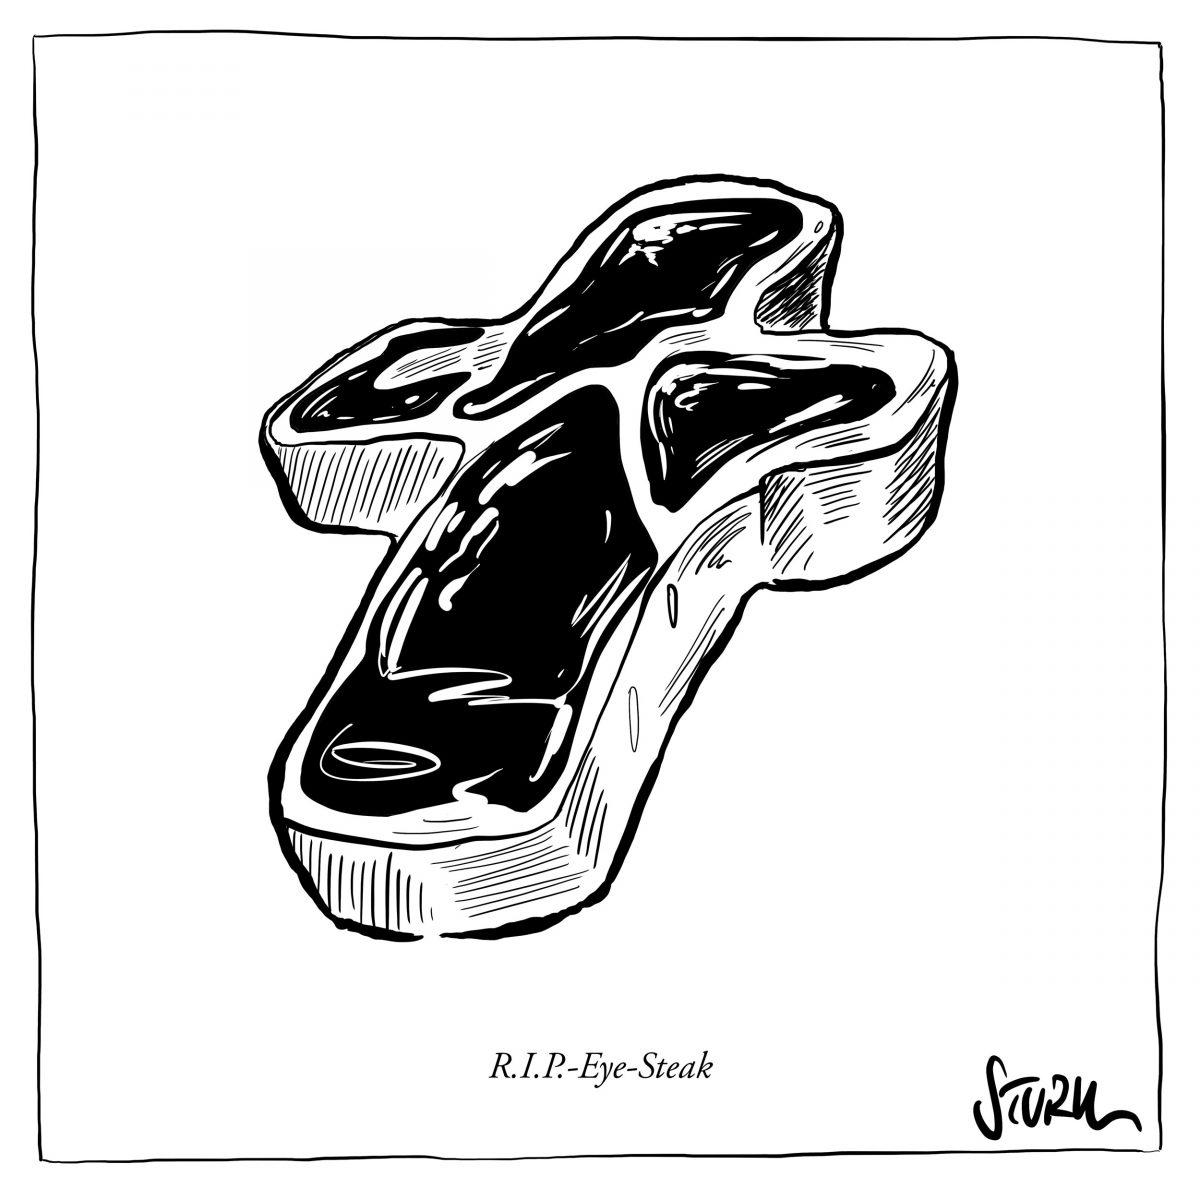 R.I.P.-Eye-Steak – Graphic by Philipp Sturm